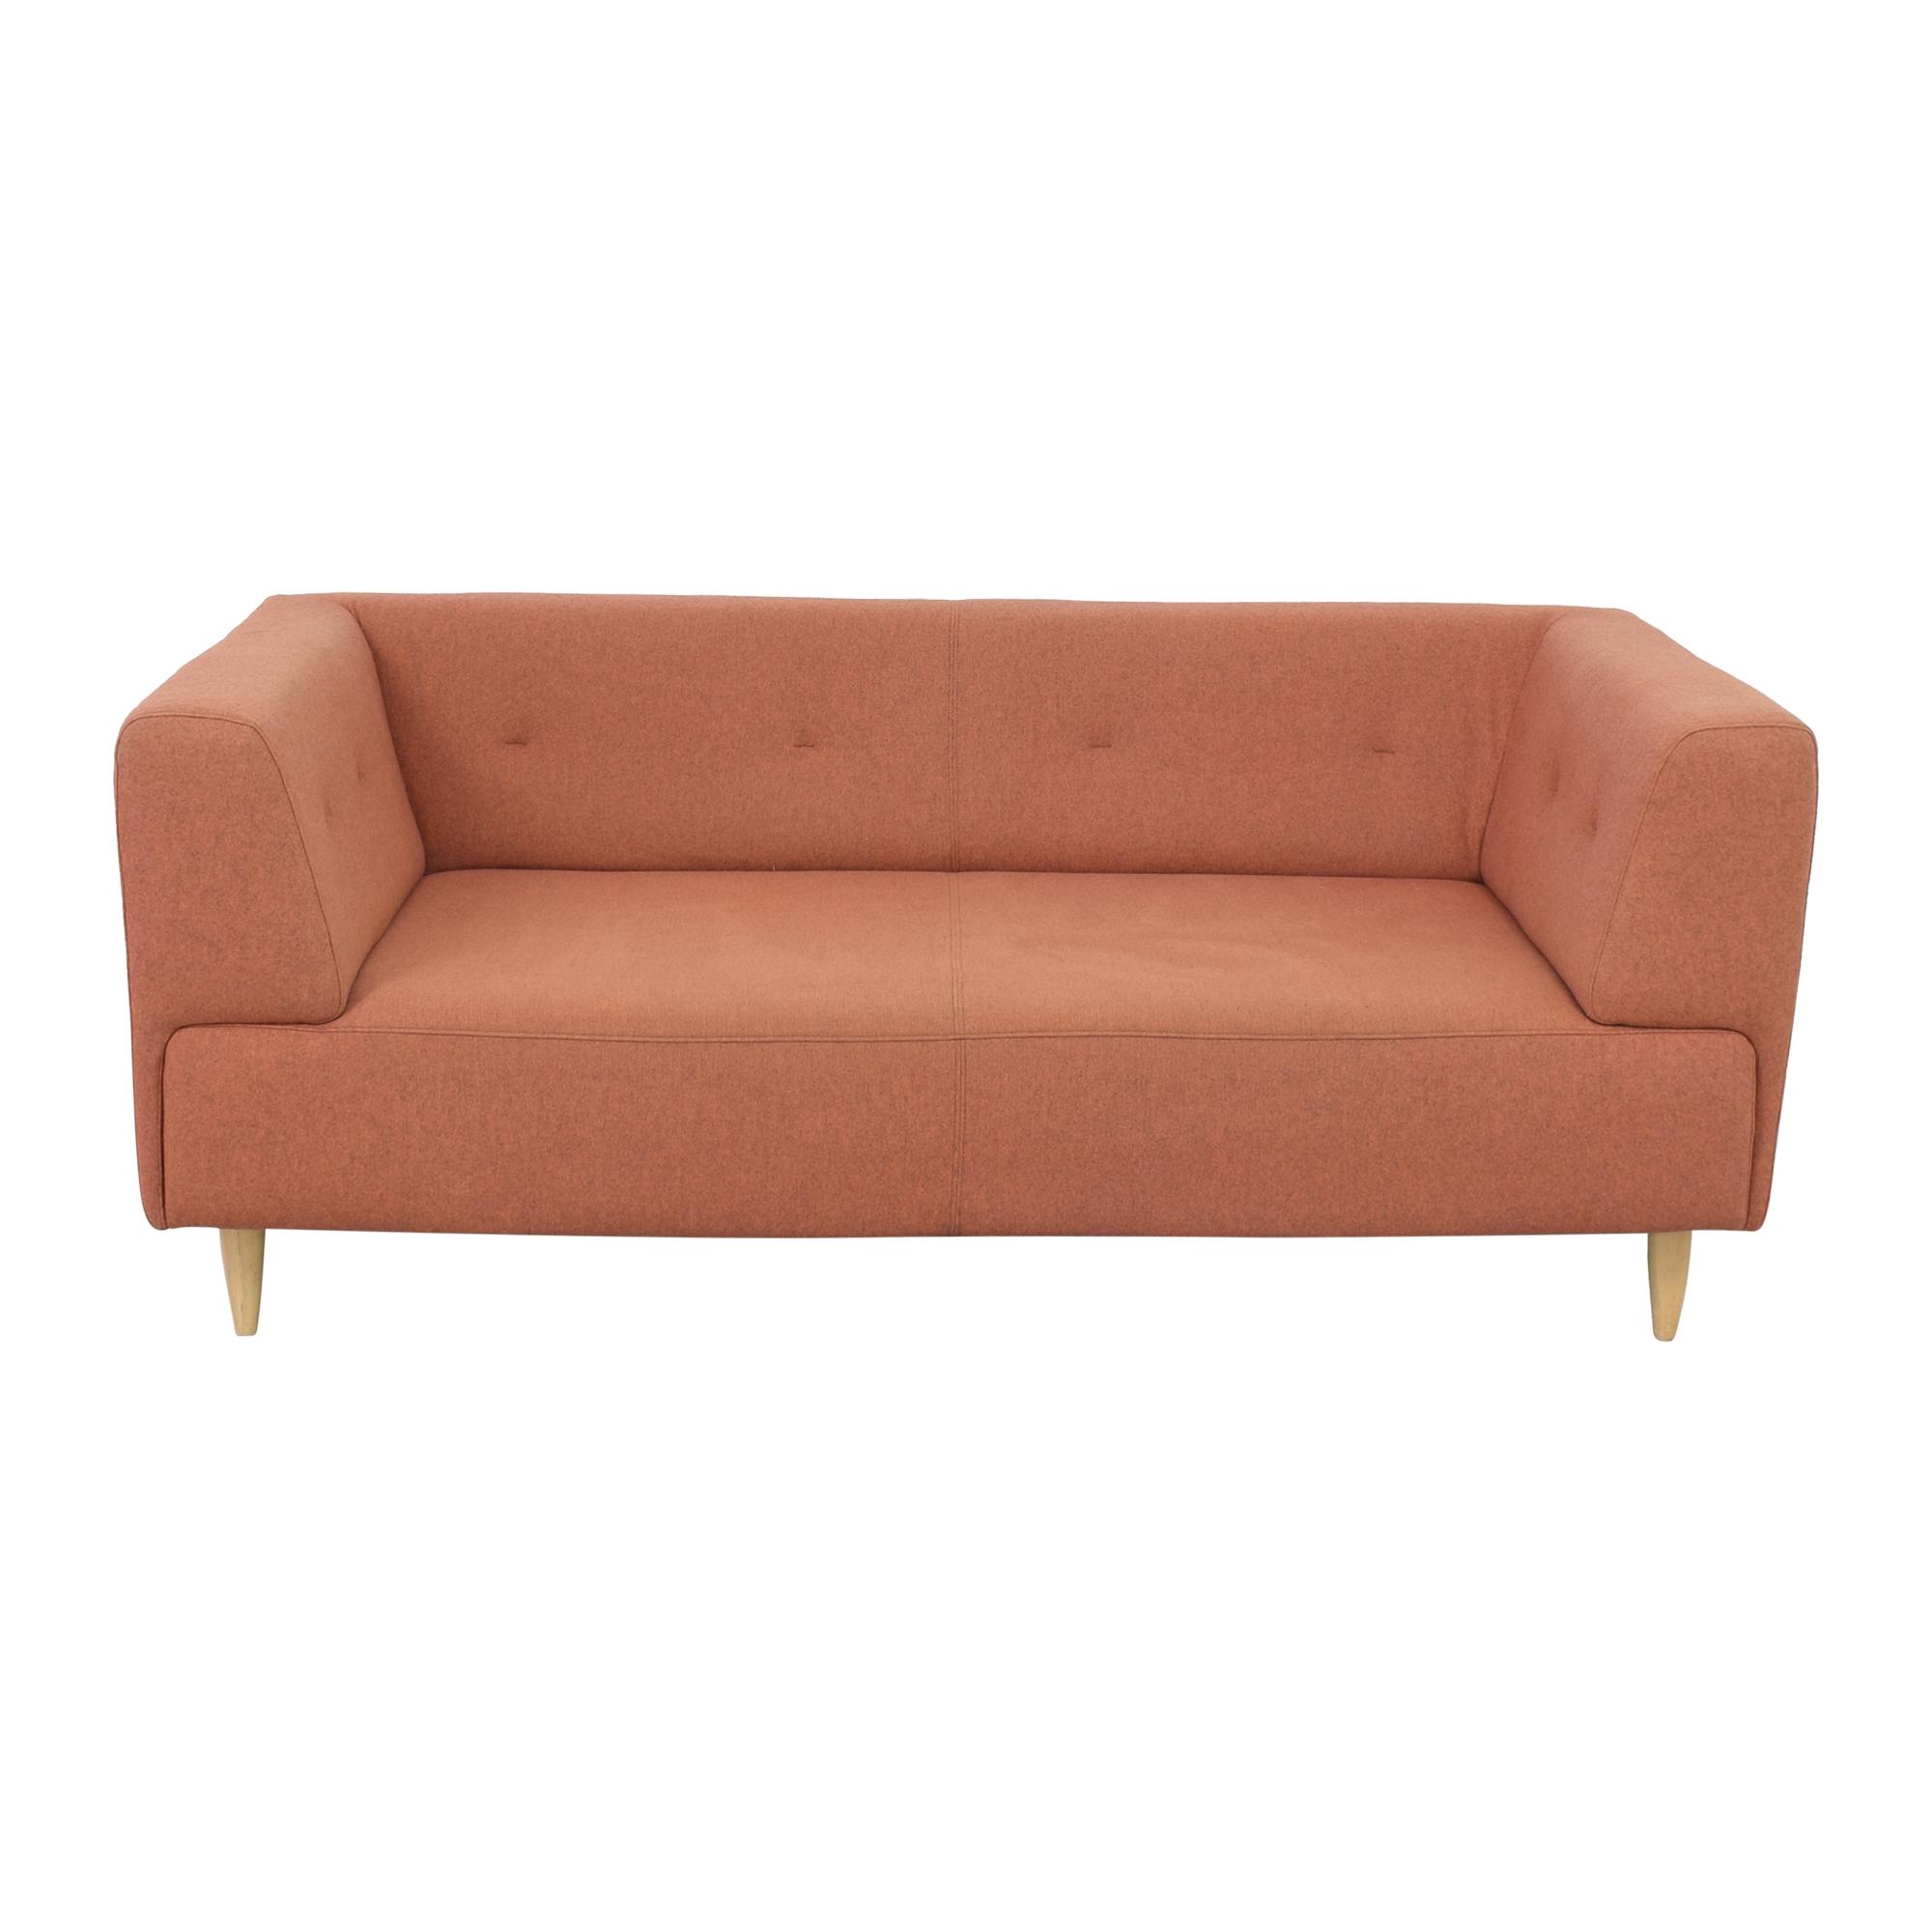 BoConcept BoConcept Two Seater Sofa Sofas